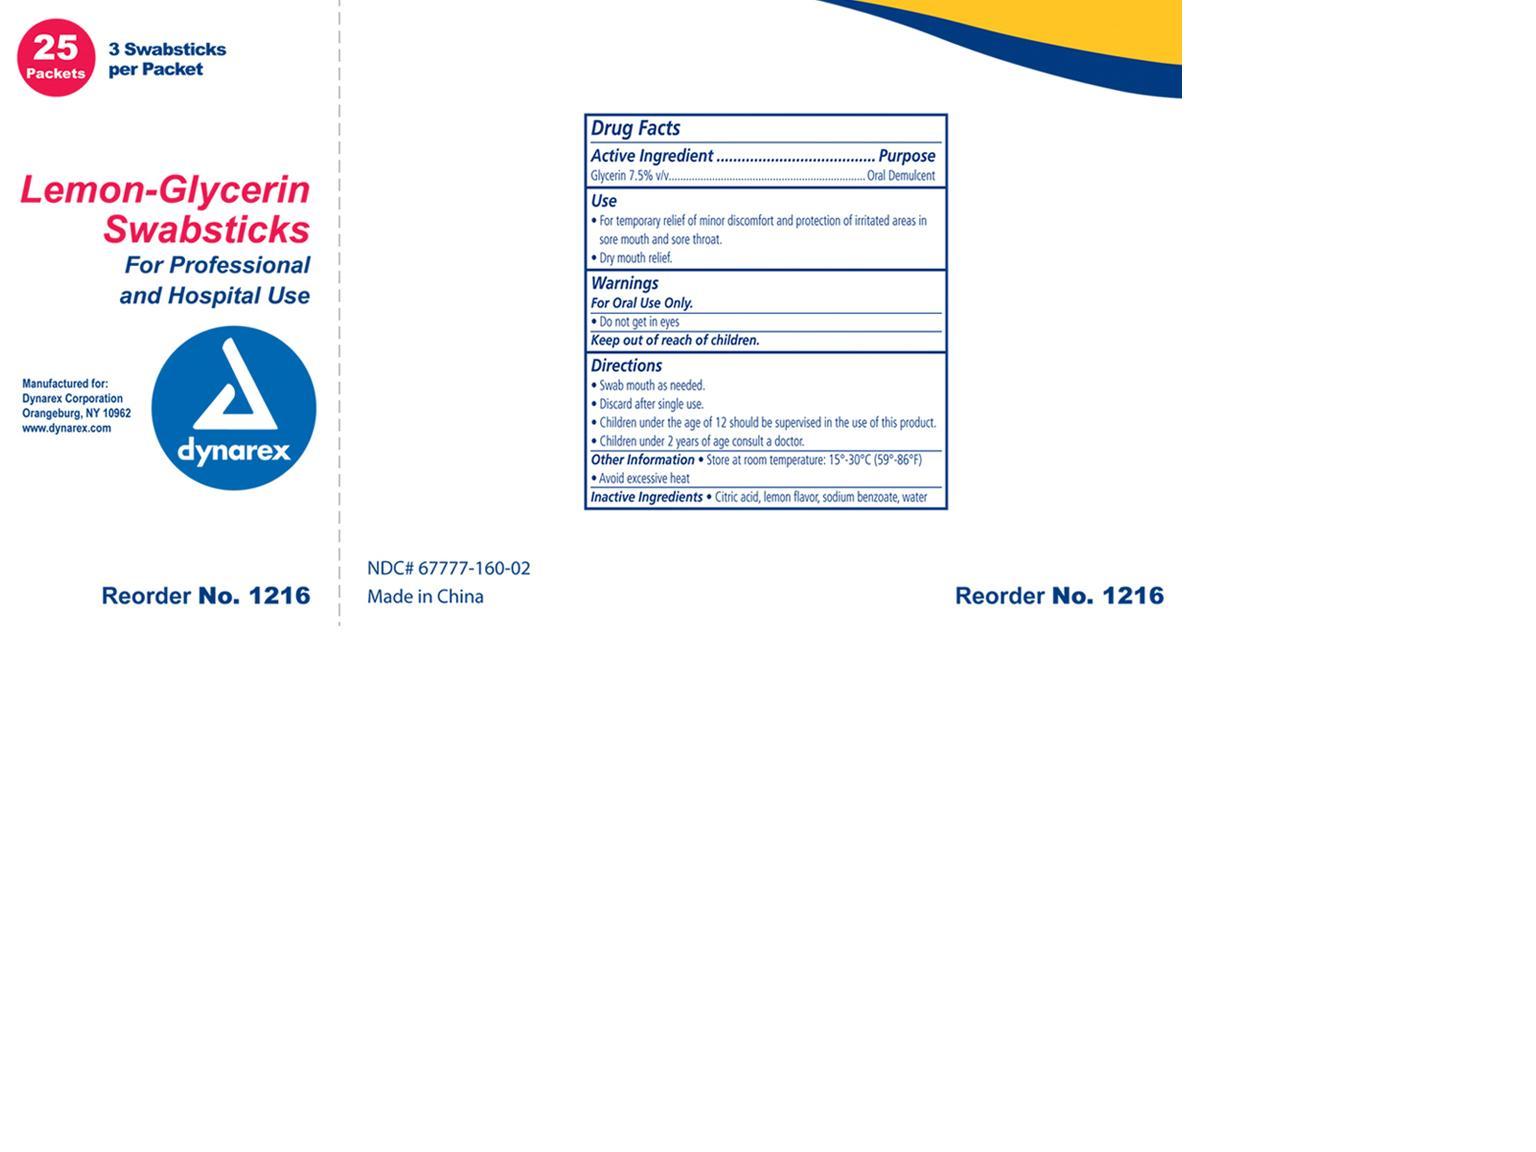 Lemon Glycerin (Glycerin) Swab [Dynarex Corporation]